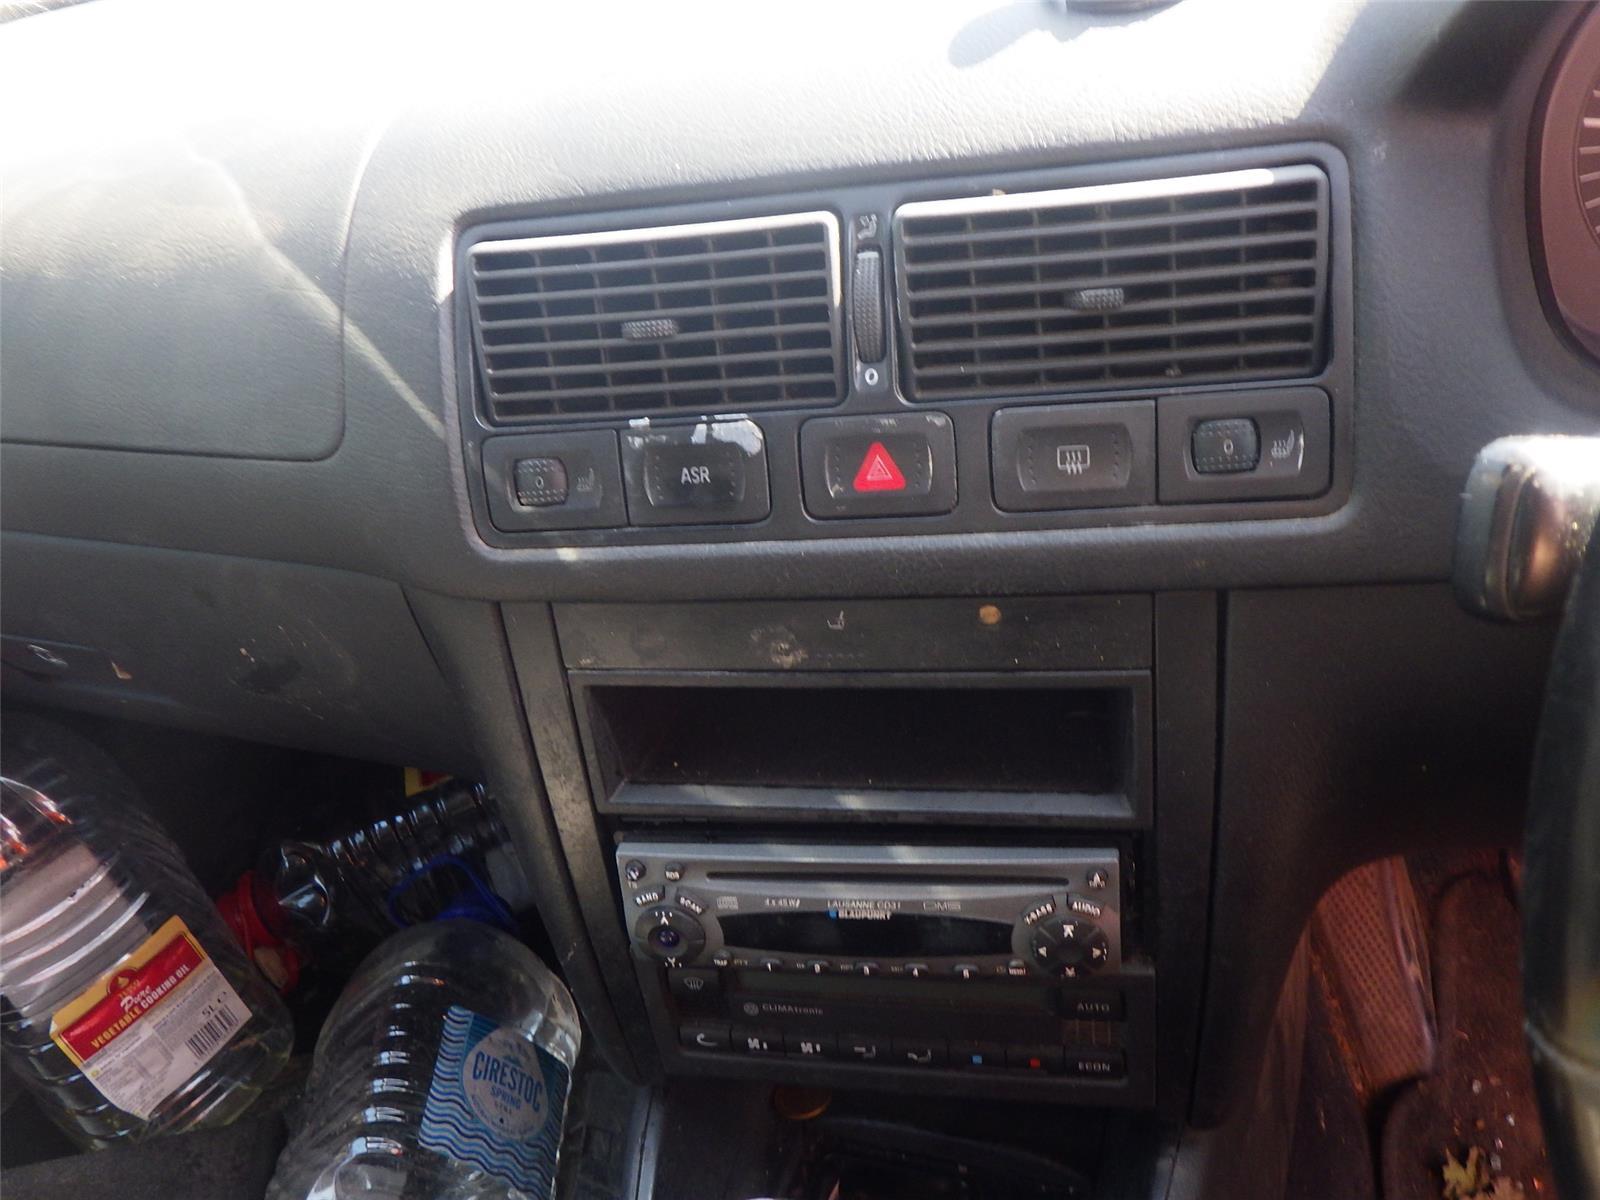 2002 volkswagen golf mk4 1997 to 2003 3 door hatchback diesel rh scbvehicledismantlers co uk 97 vw golf manual transmission 97 vw golf manual transmission